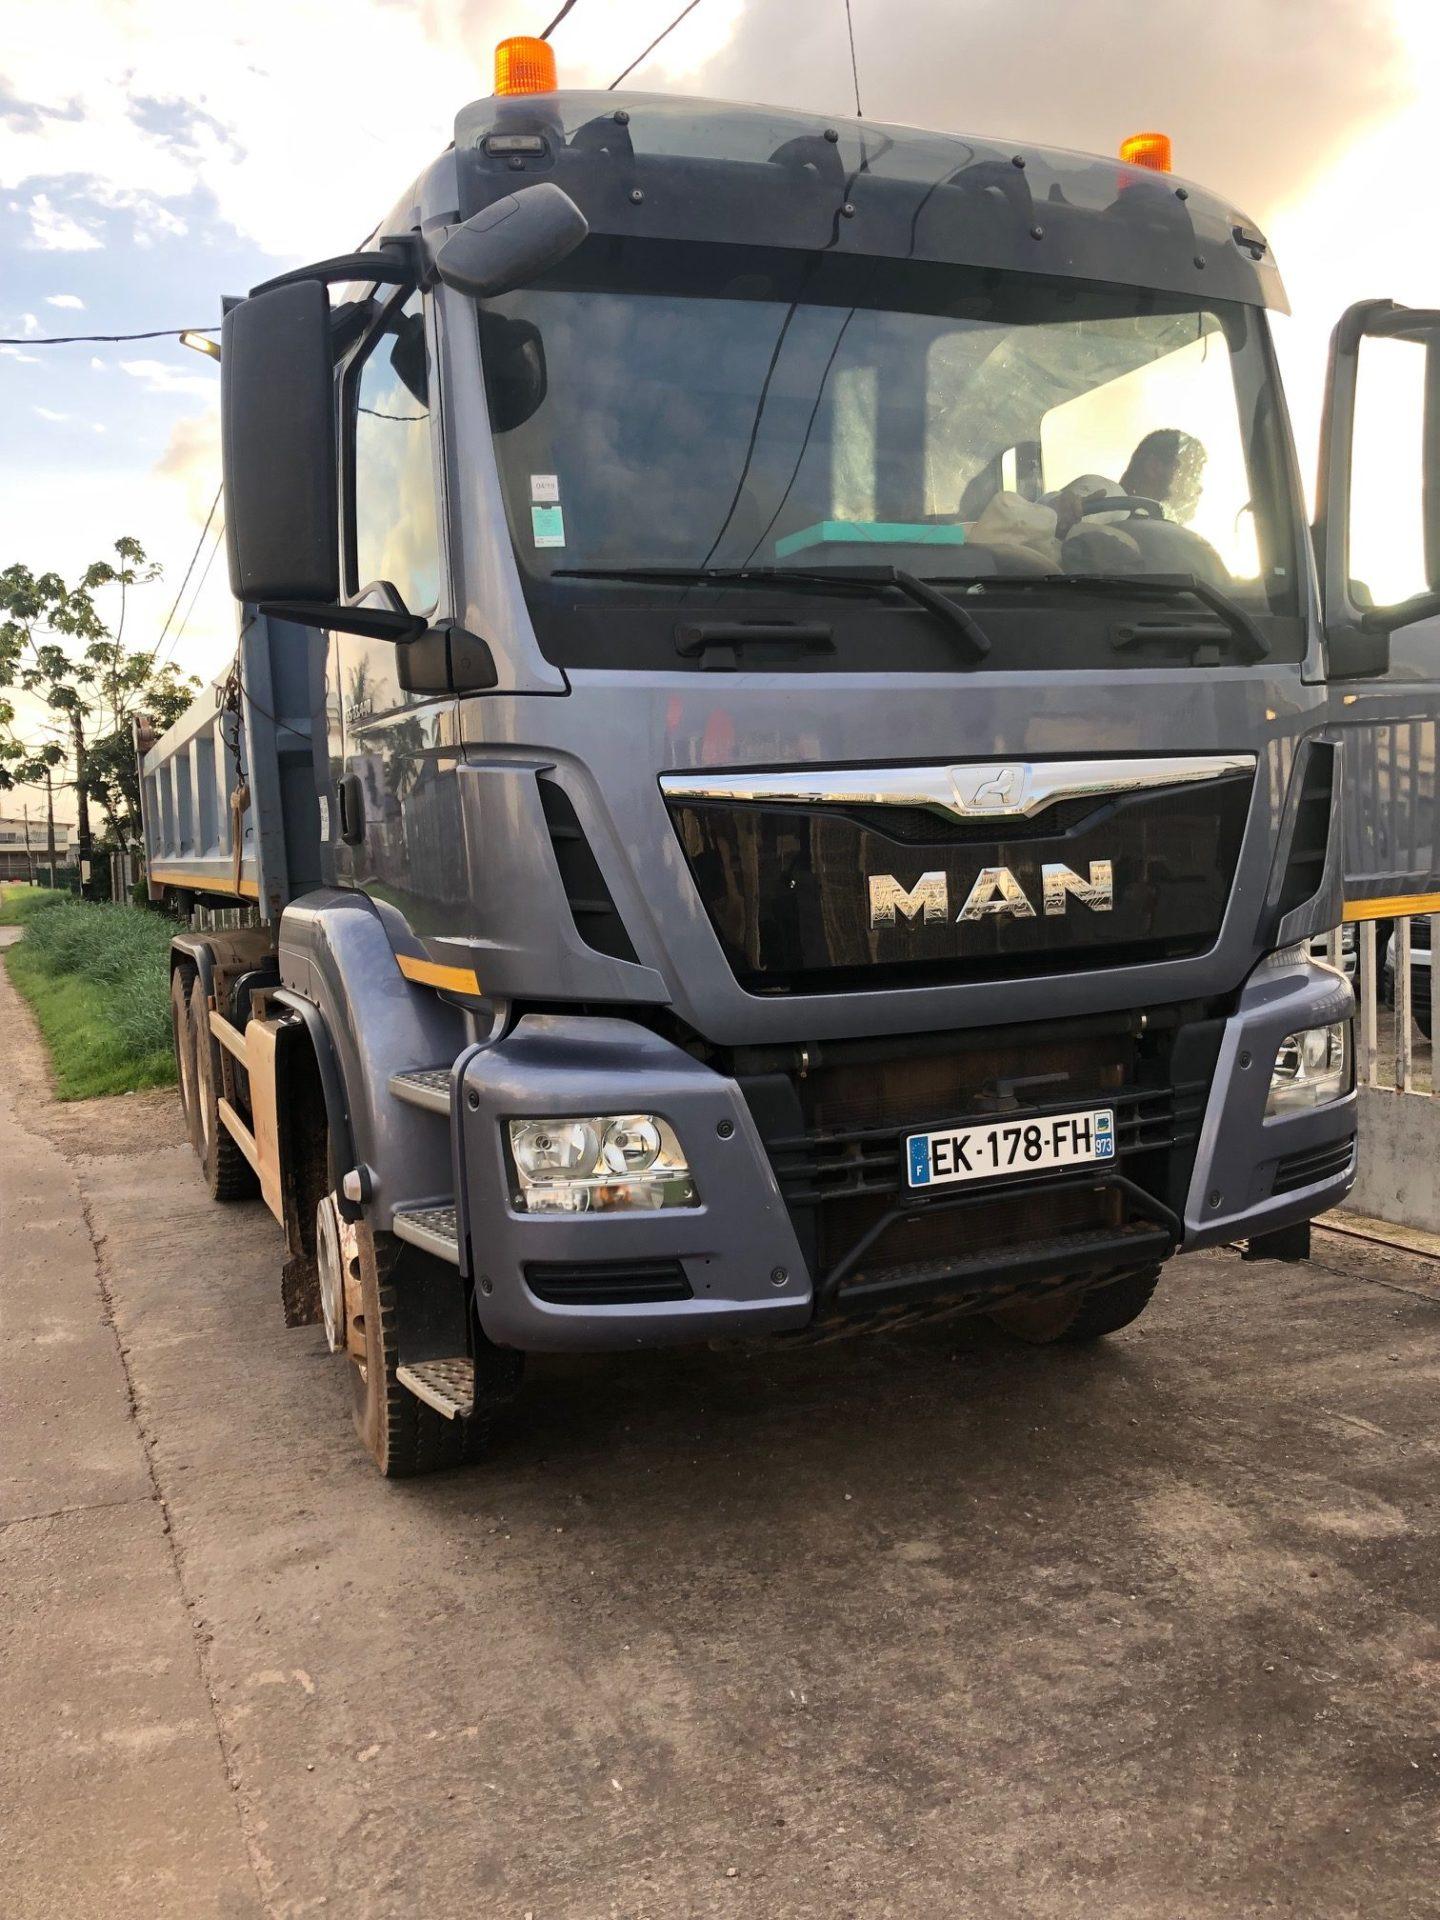 Transports RSG / Guyane